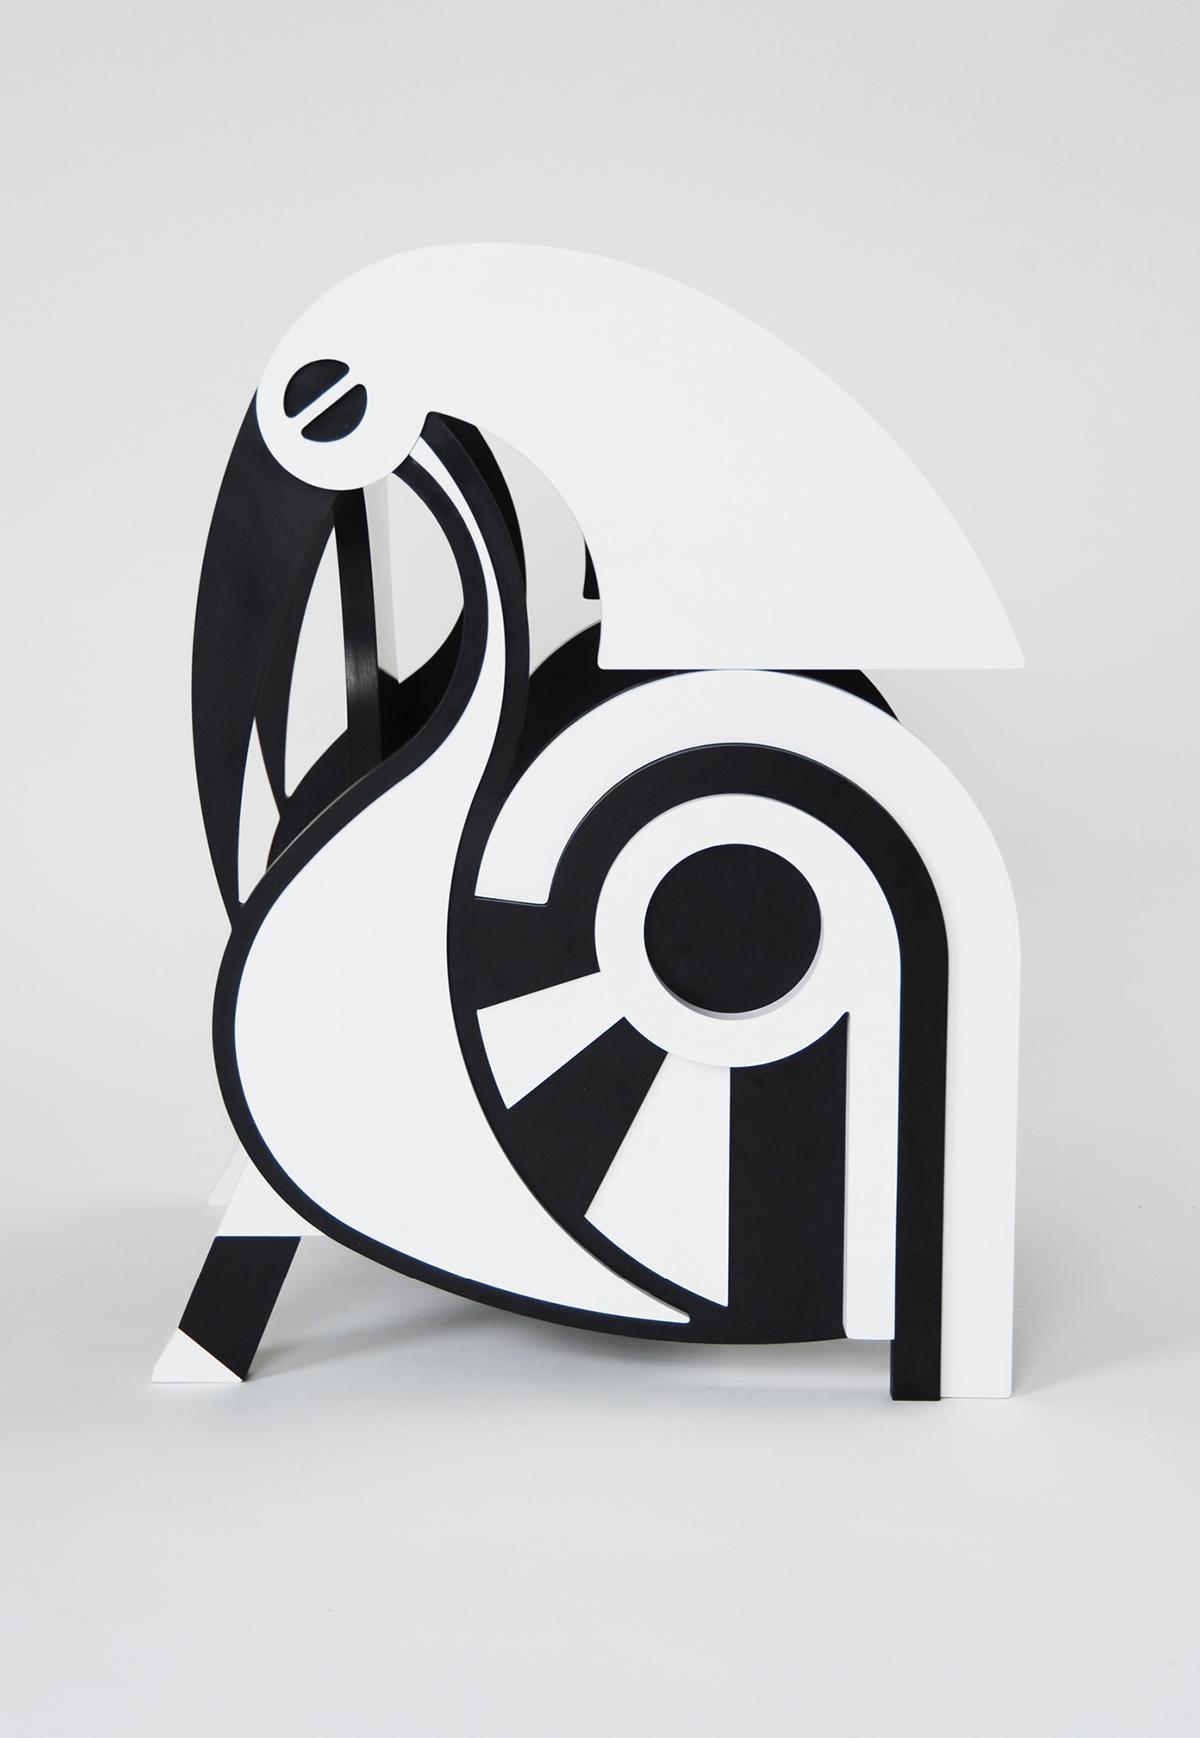 Crawl-chair-Materiallust-New-York-Design-Week-Collective-Childrens-Furniture-7.jpg